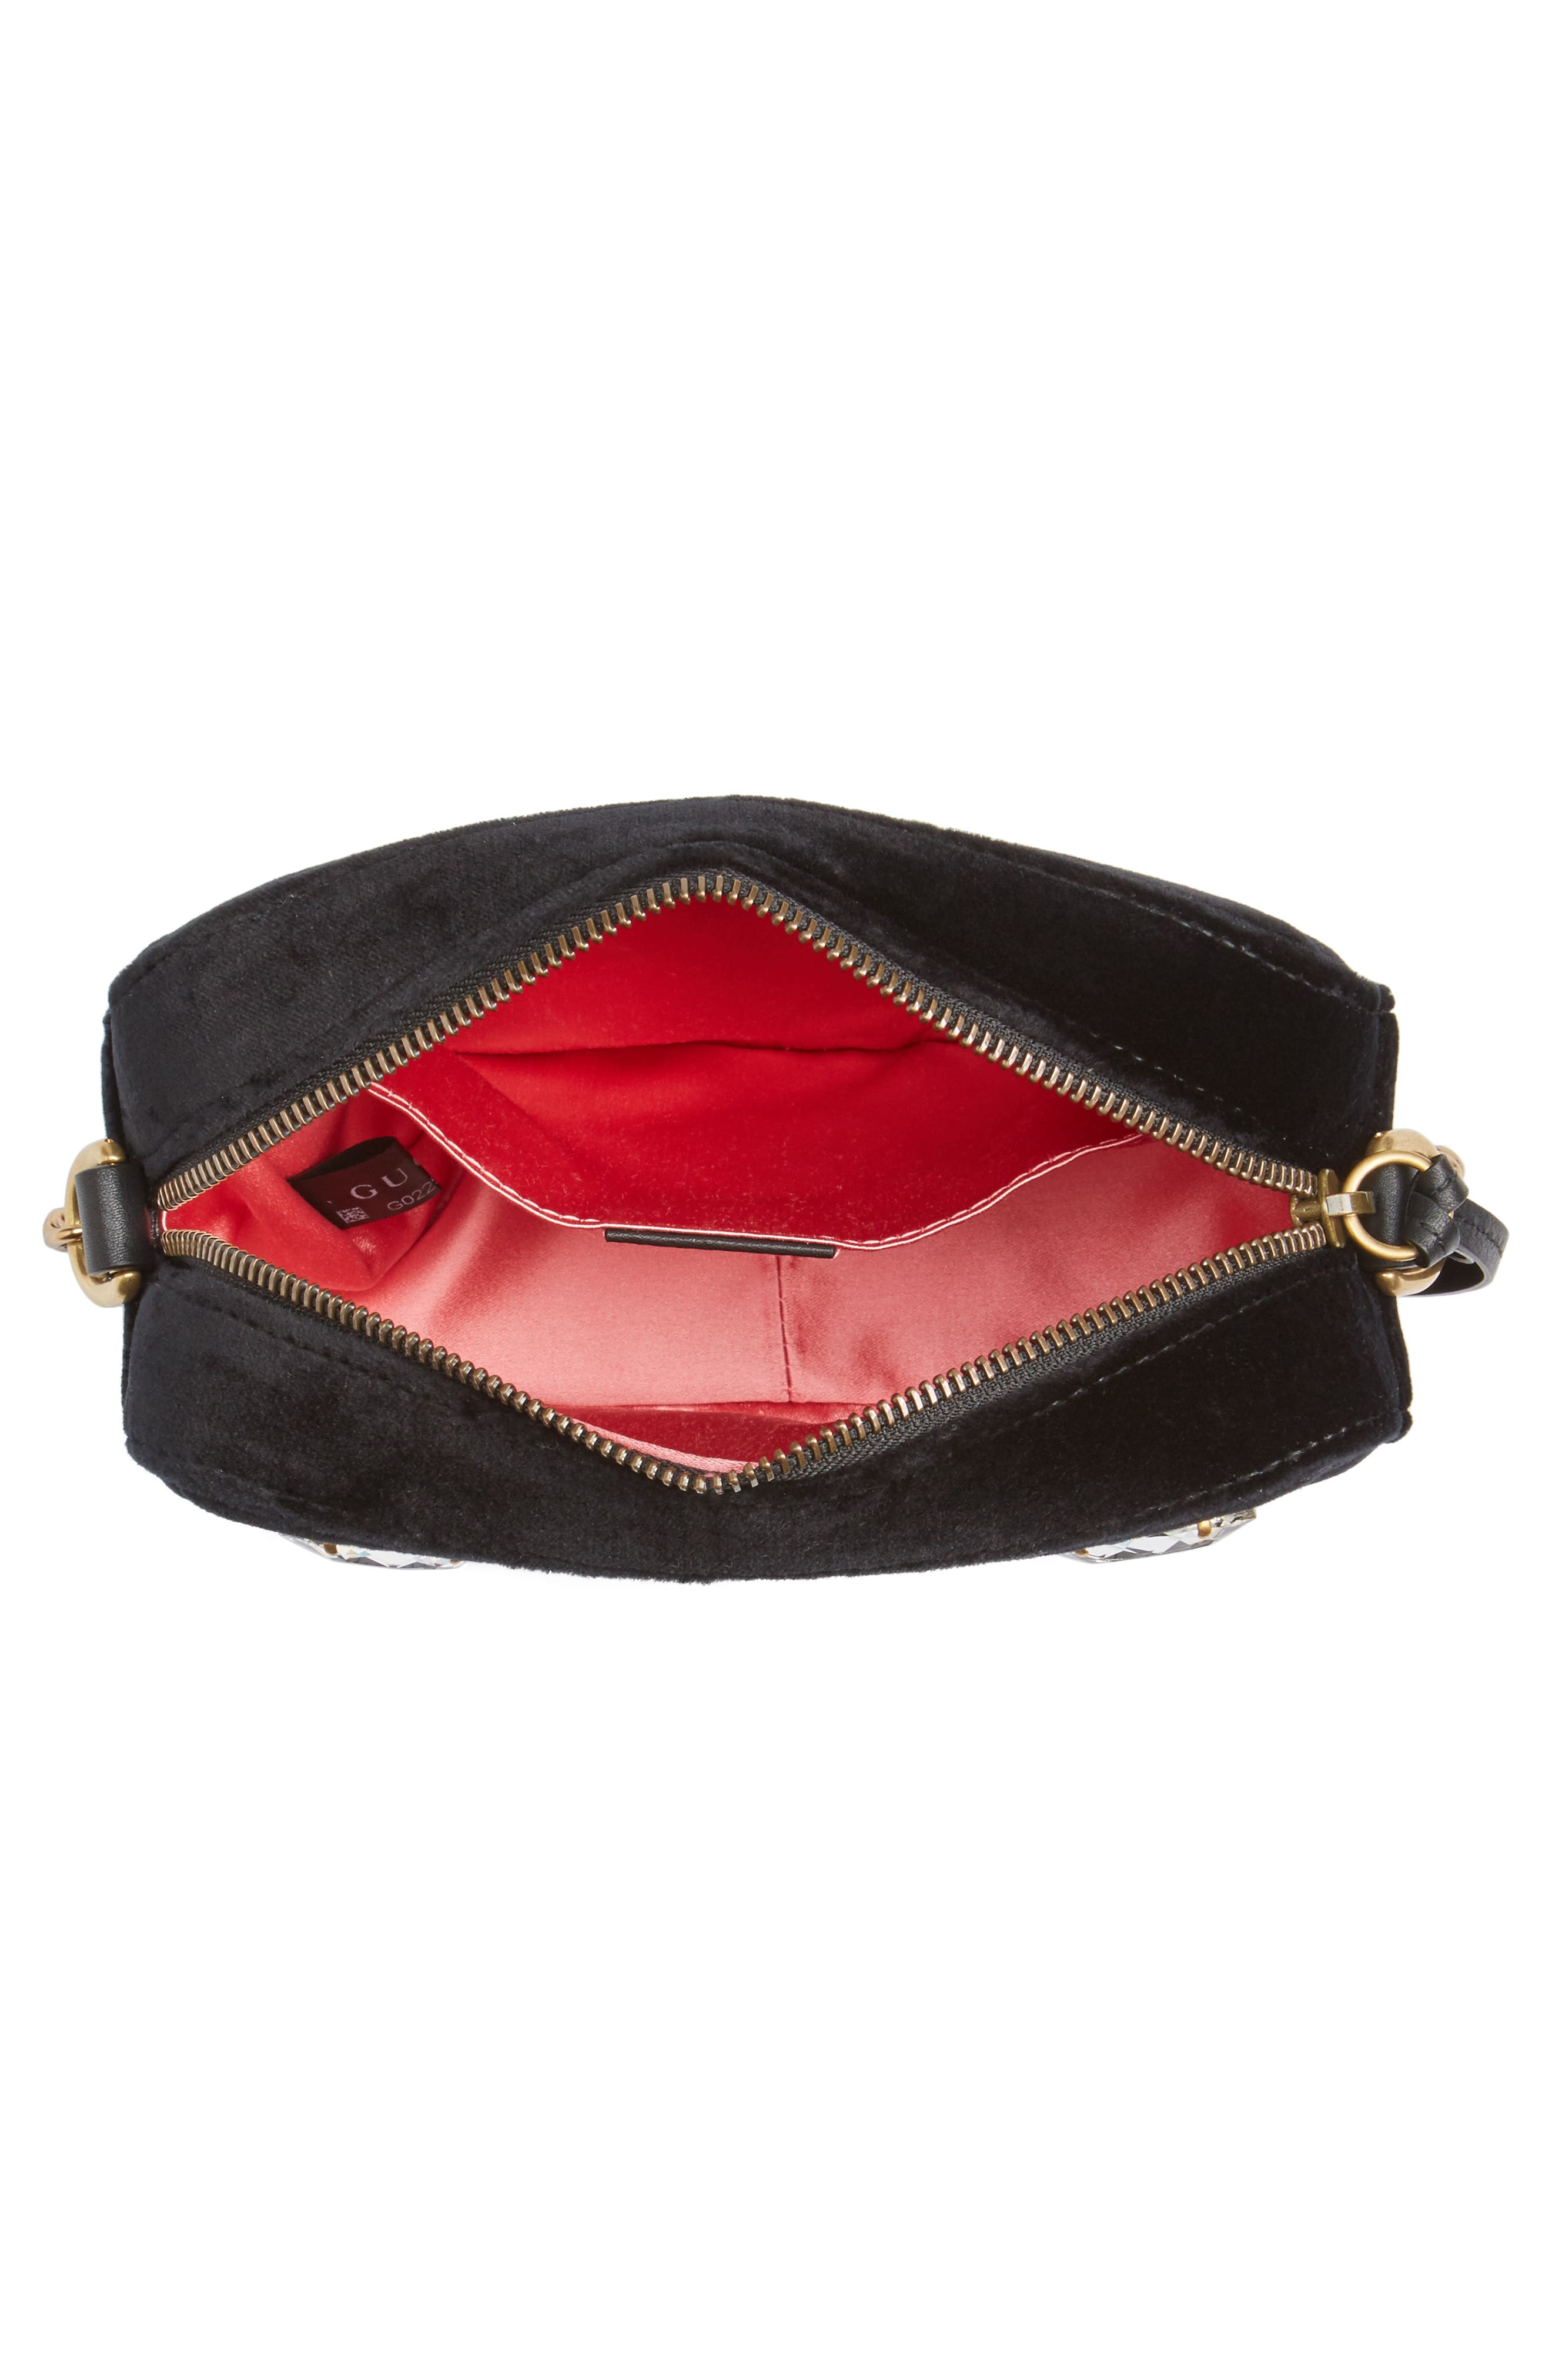 GG Marmont Crystal Matelassé Quilted Velvet Crossbody Bag,                             Alternate thumbnail 4, color,                             001